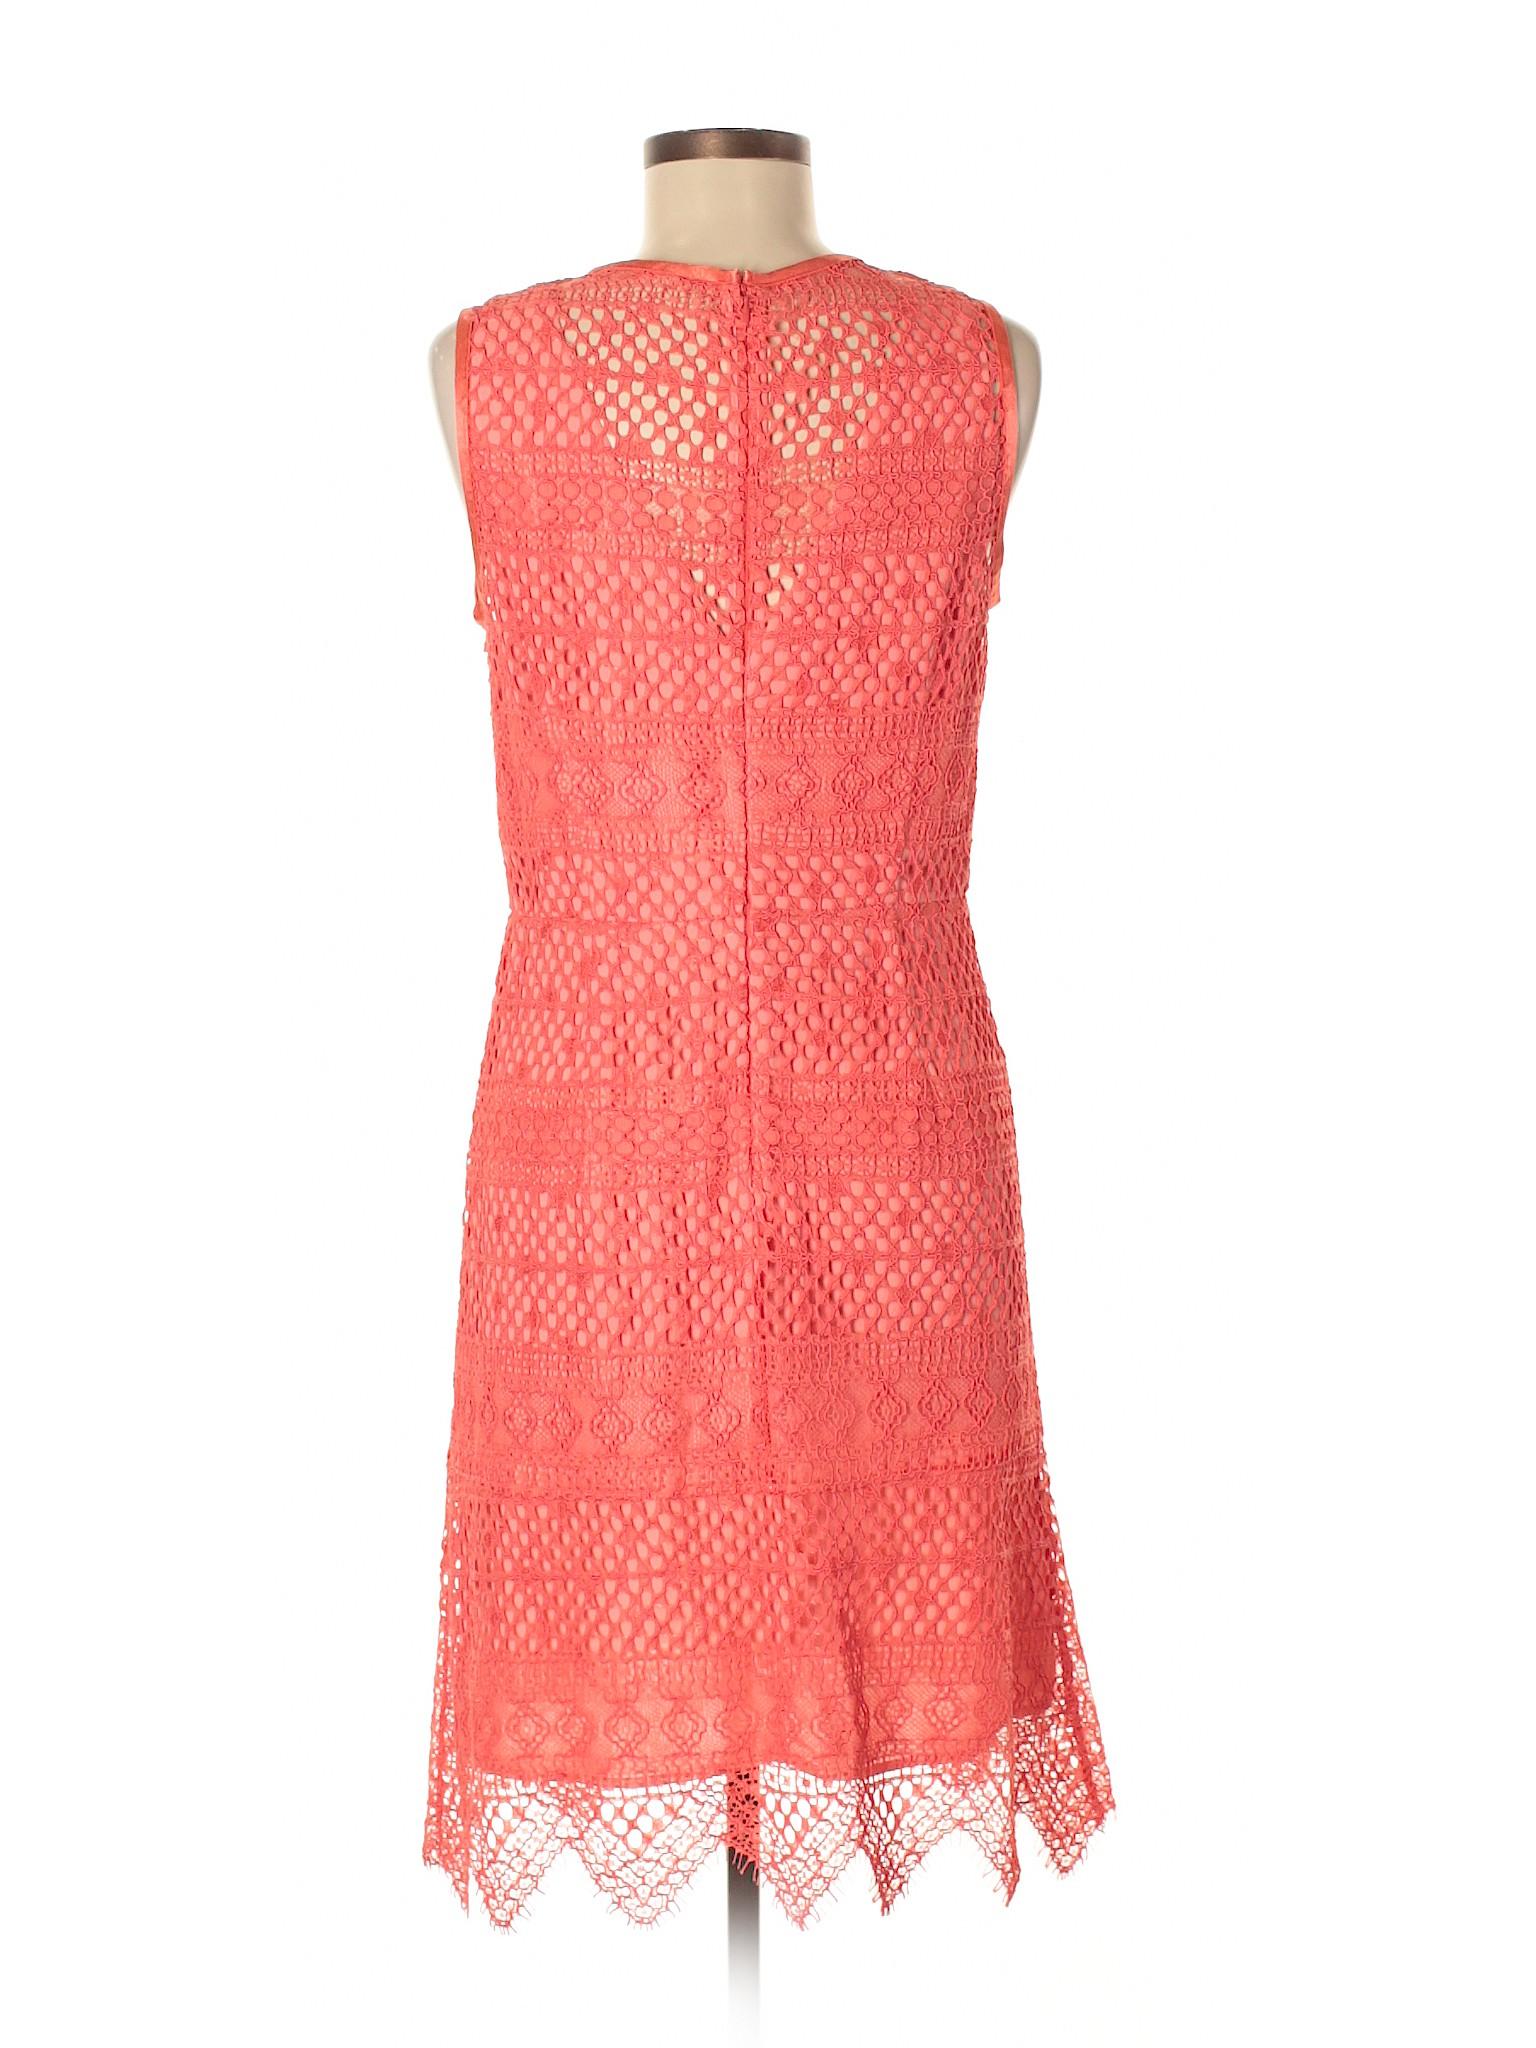 Boutique Shoshanna Dress winter Boutique winter Casual Oyqgw8x5